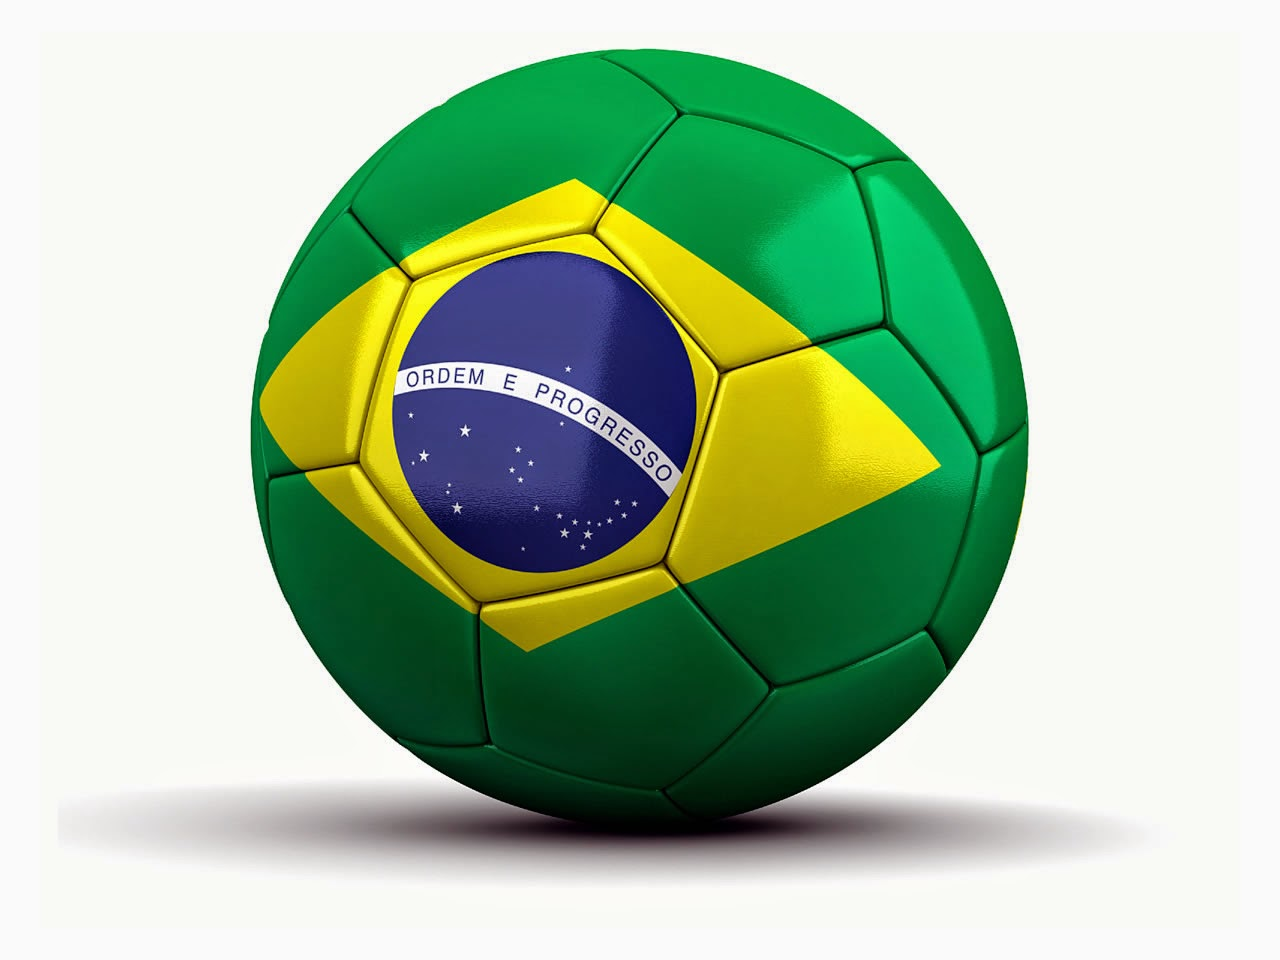 Brazil, Brasil, Regras Futebol, Regras Jogo Futebol, Regras FIFA Futebol, Bola, Pelota